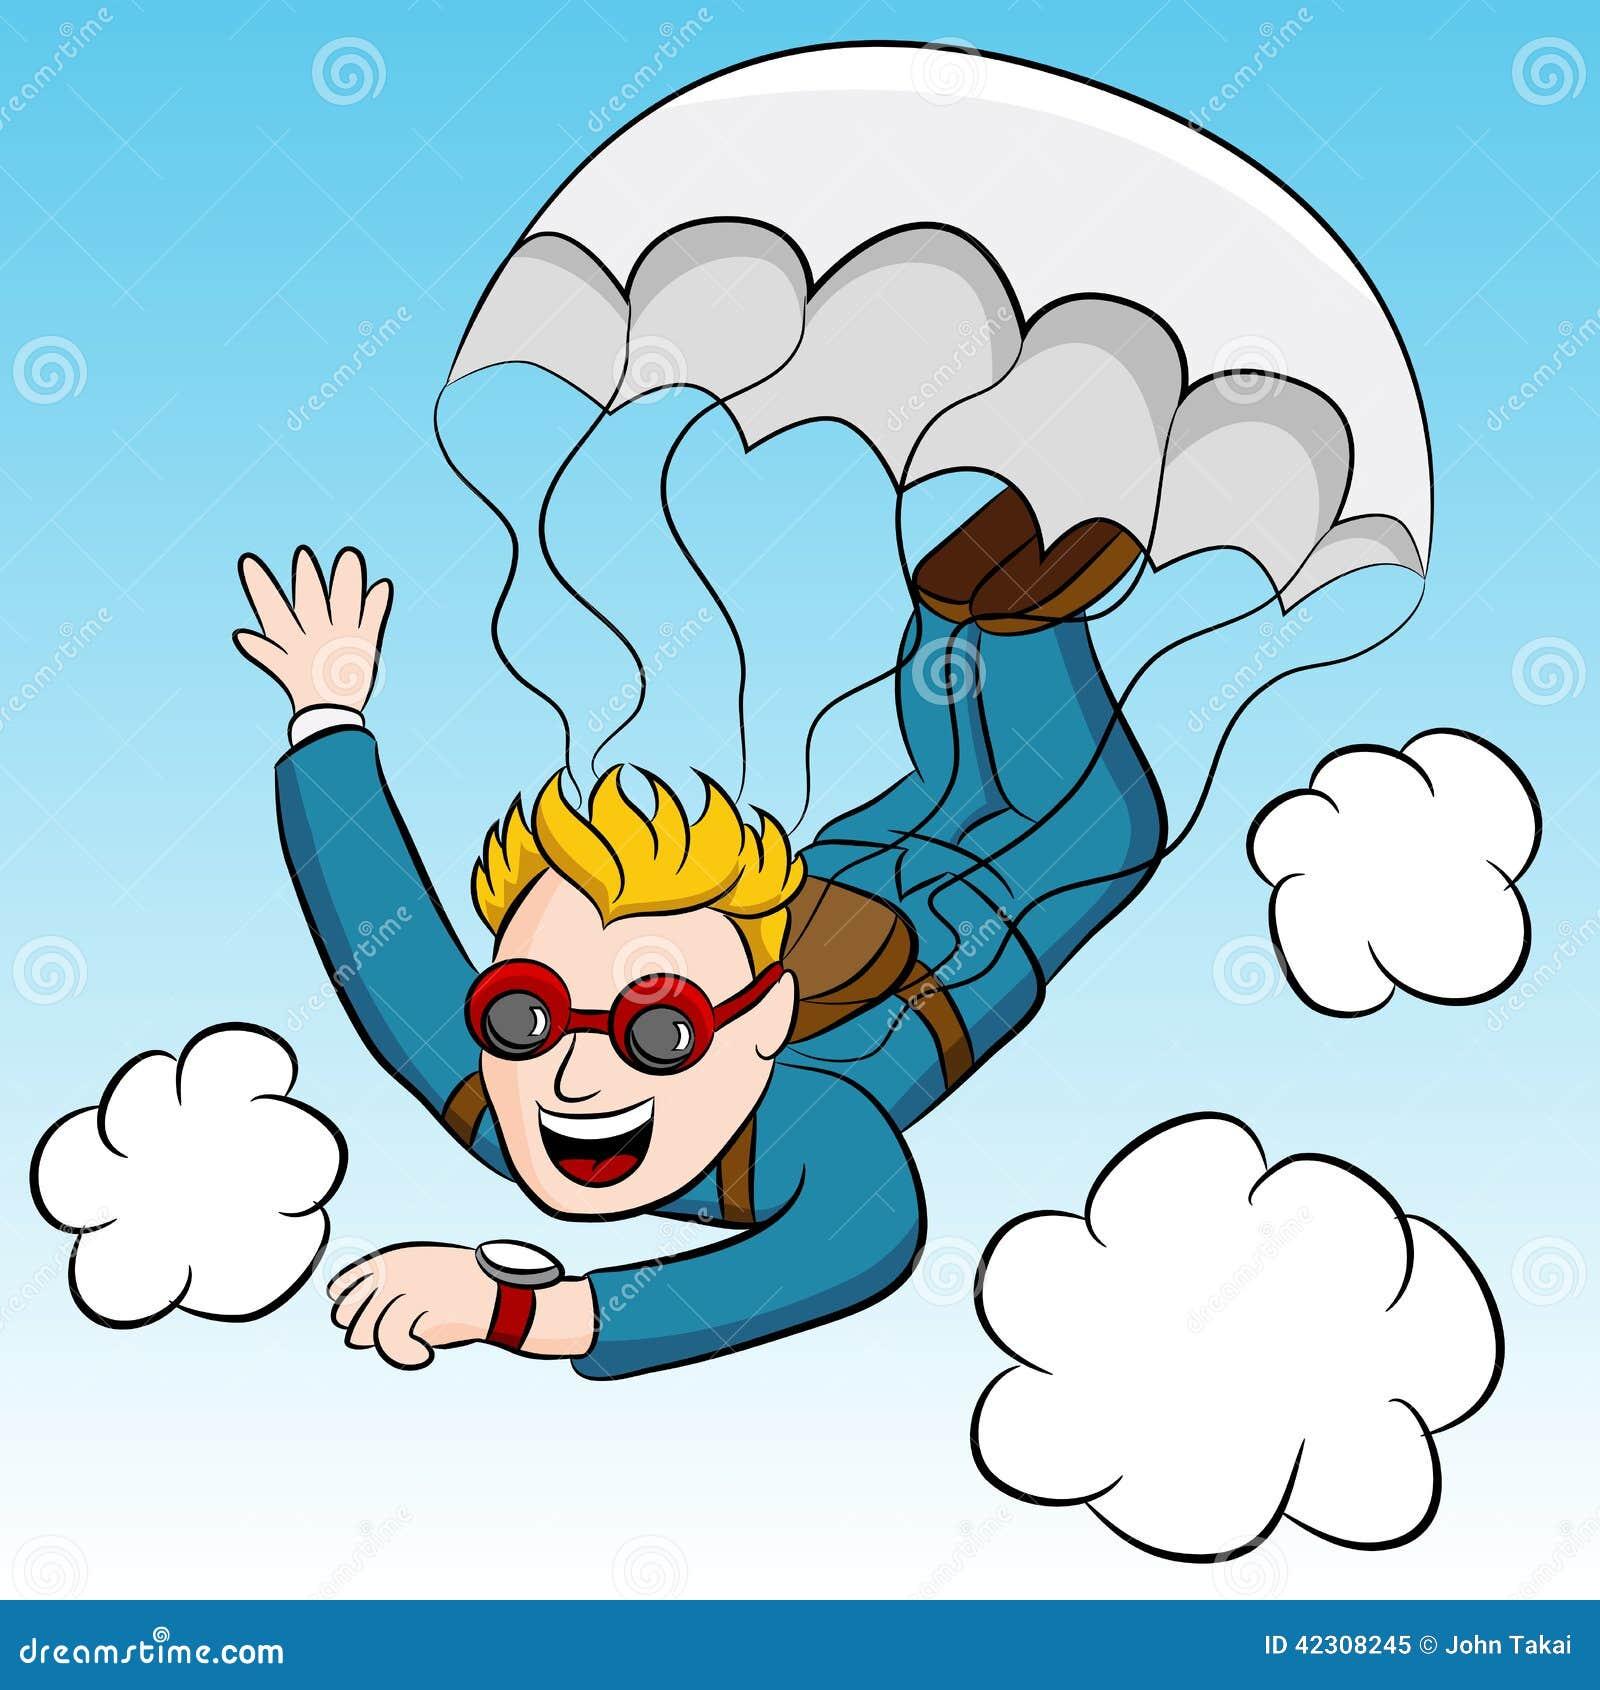 Urgent Meeting Skydiver